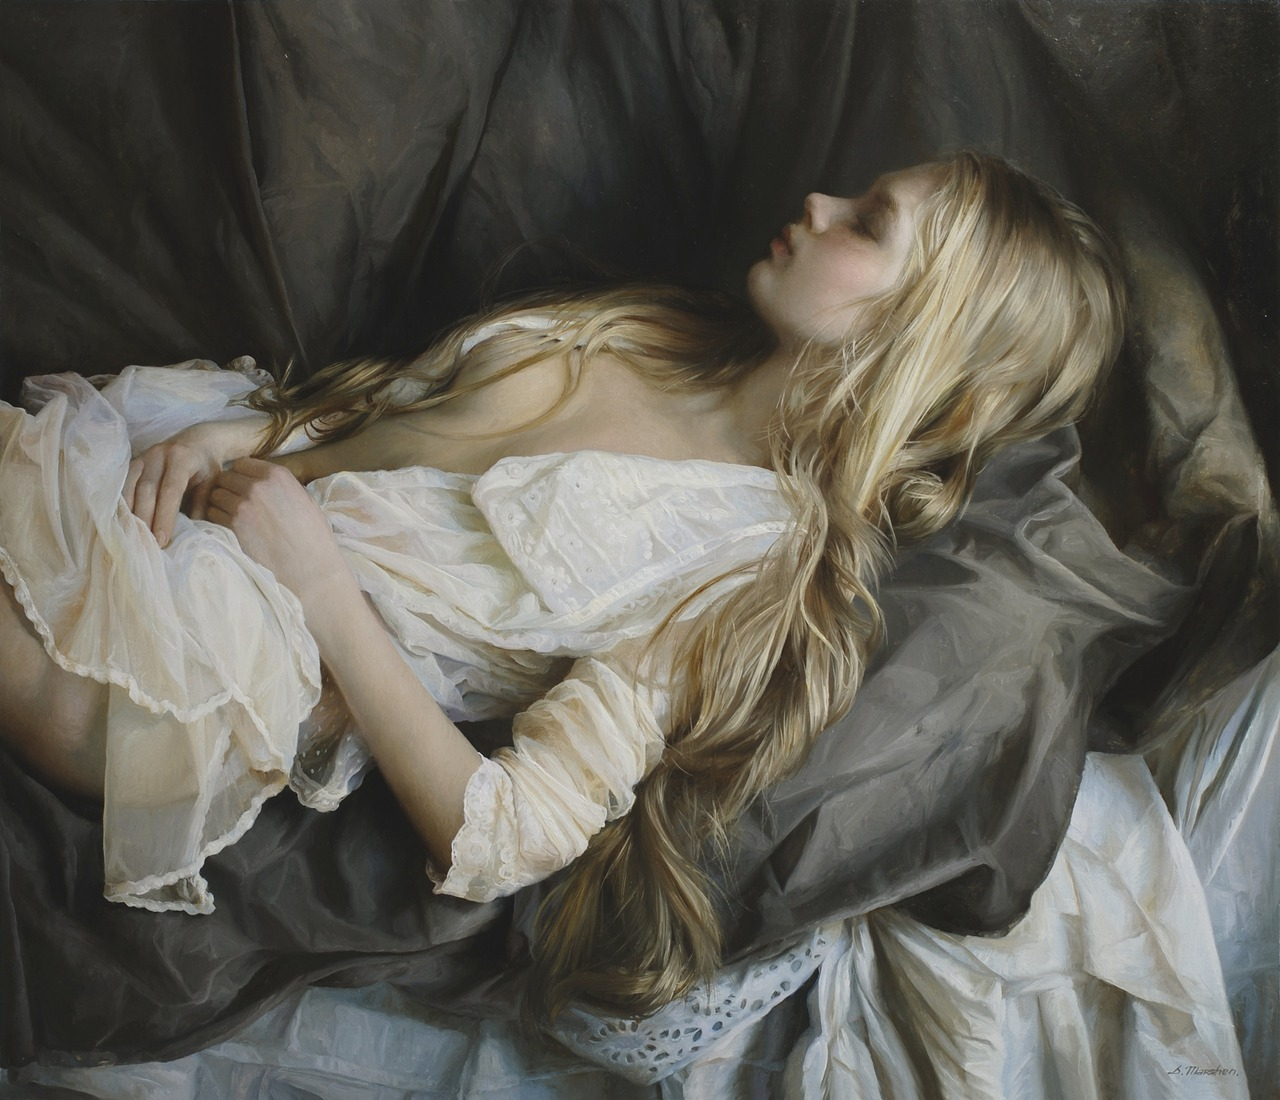 Women's images by a Russian realist artist Sergey Marshennikov - 25